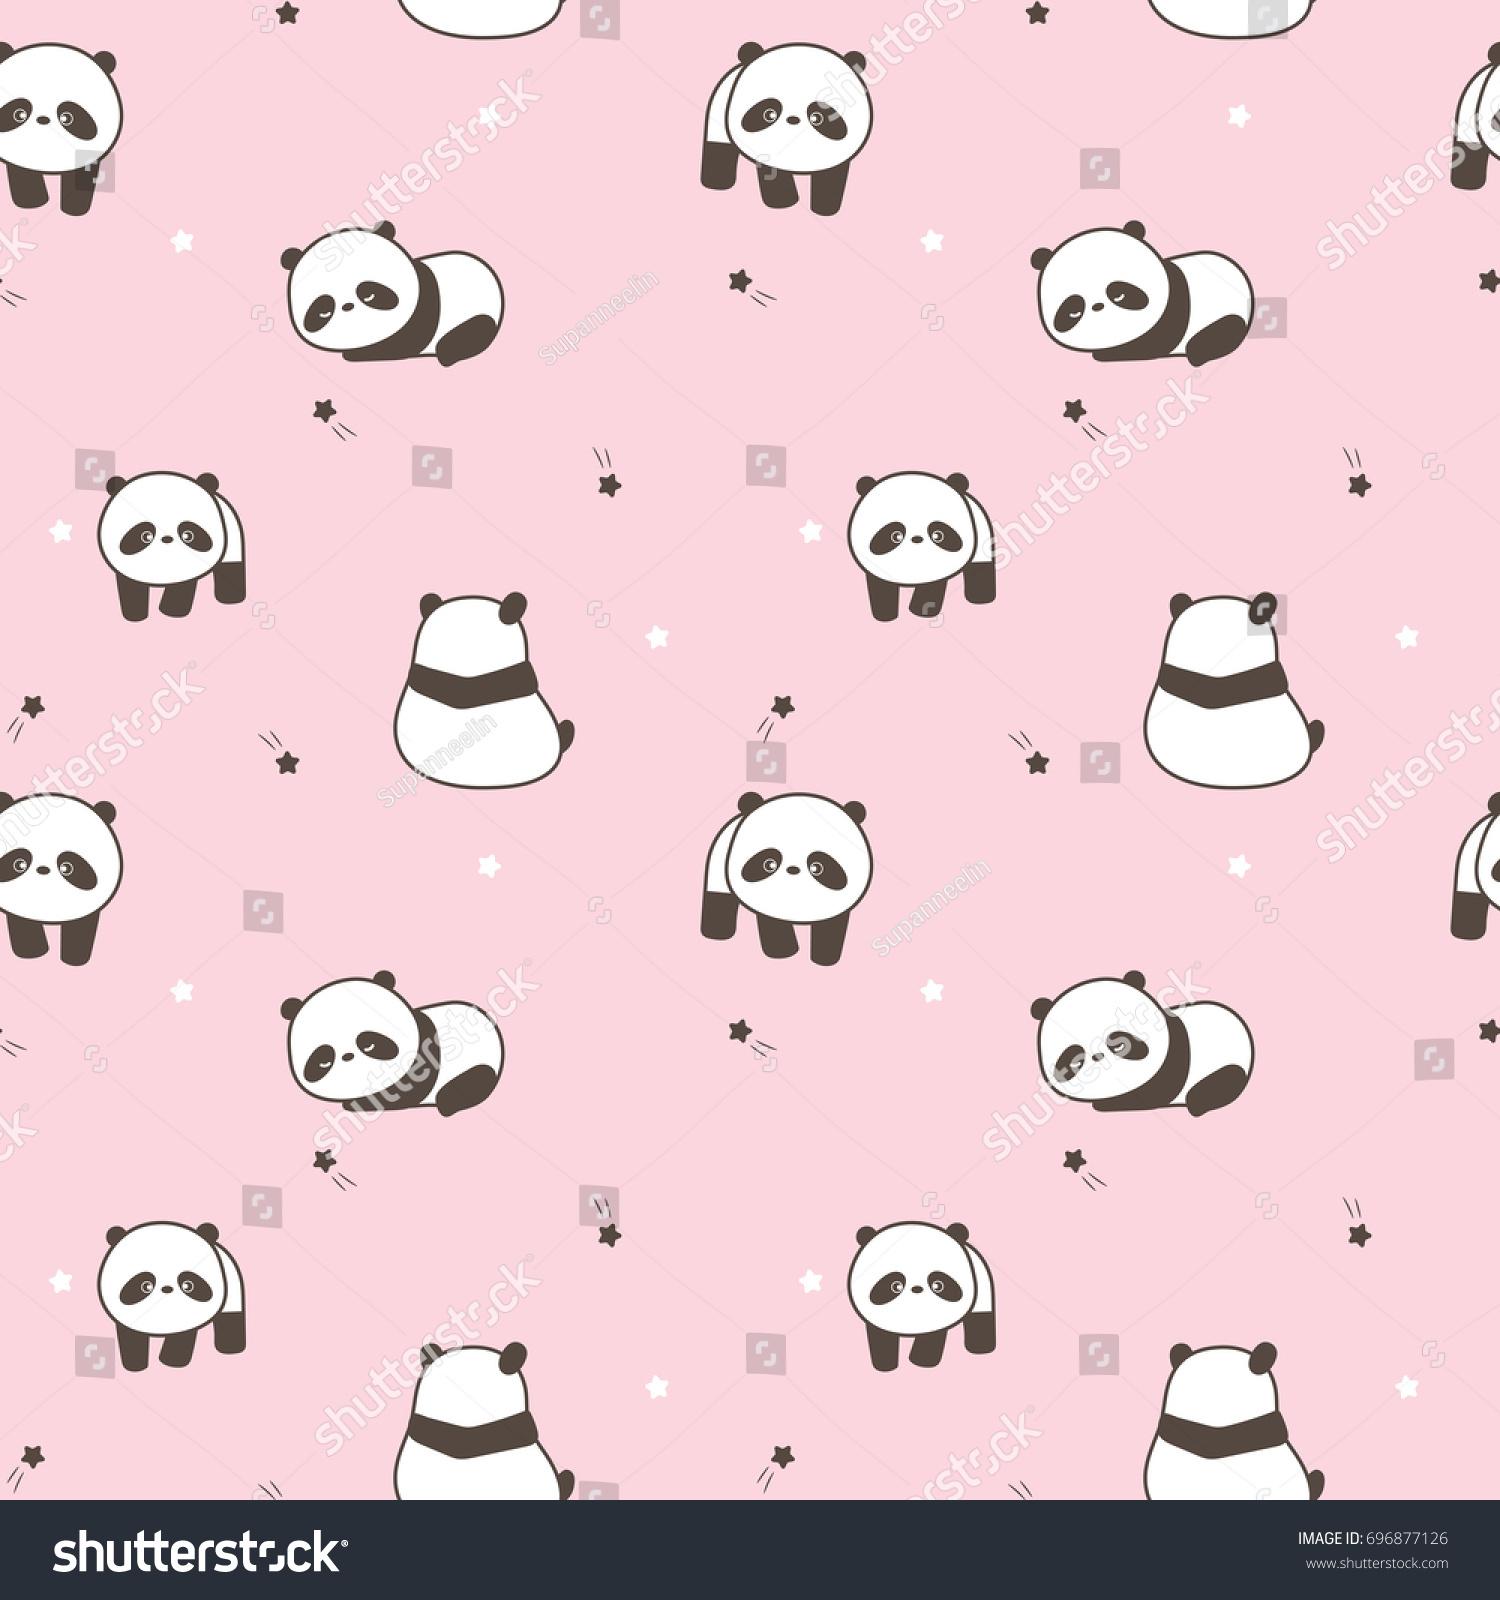 46+ Gambar Kartun Panda Lucu Warna Pink - Blog Meme Terkini